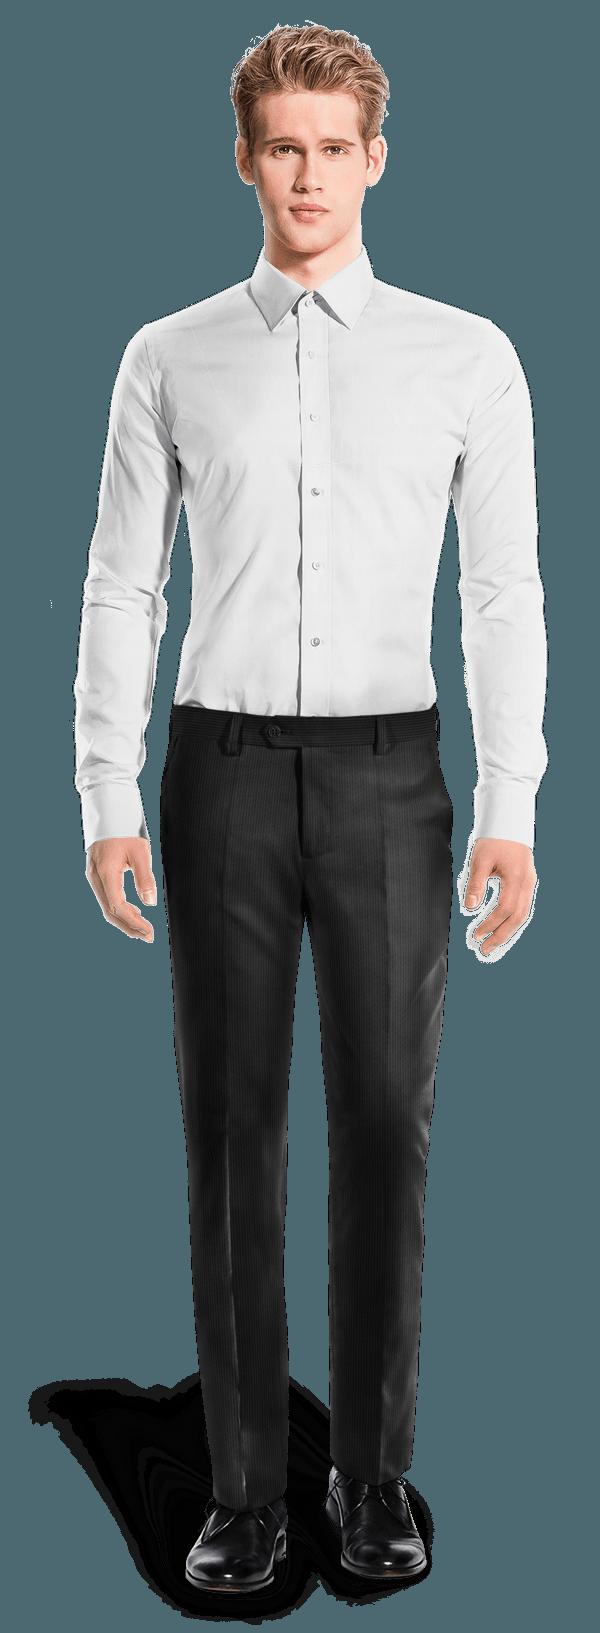 Schwarze gerade Passform Hose aus Cord